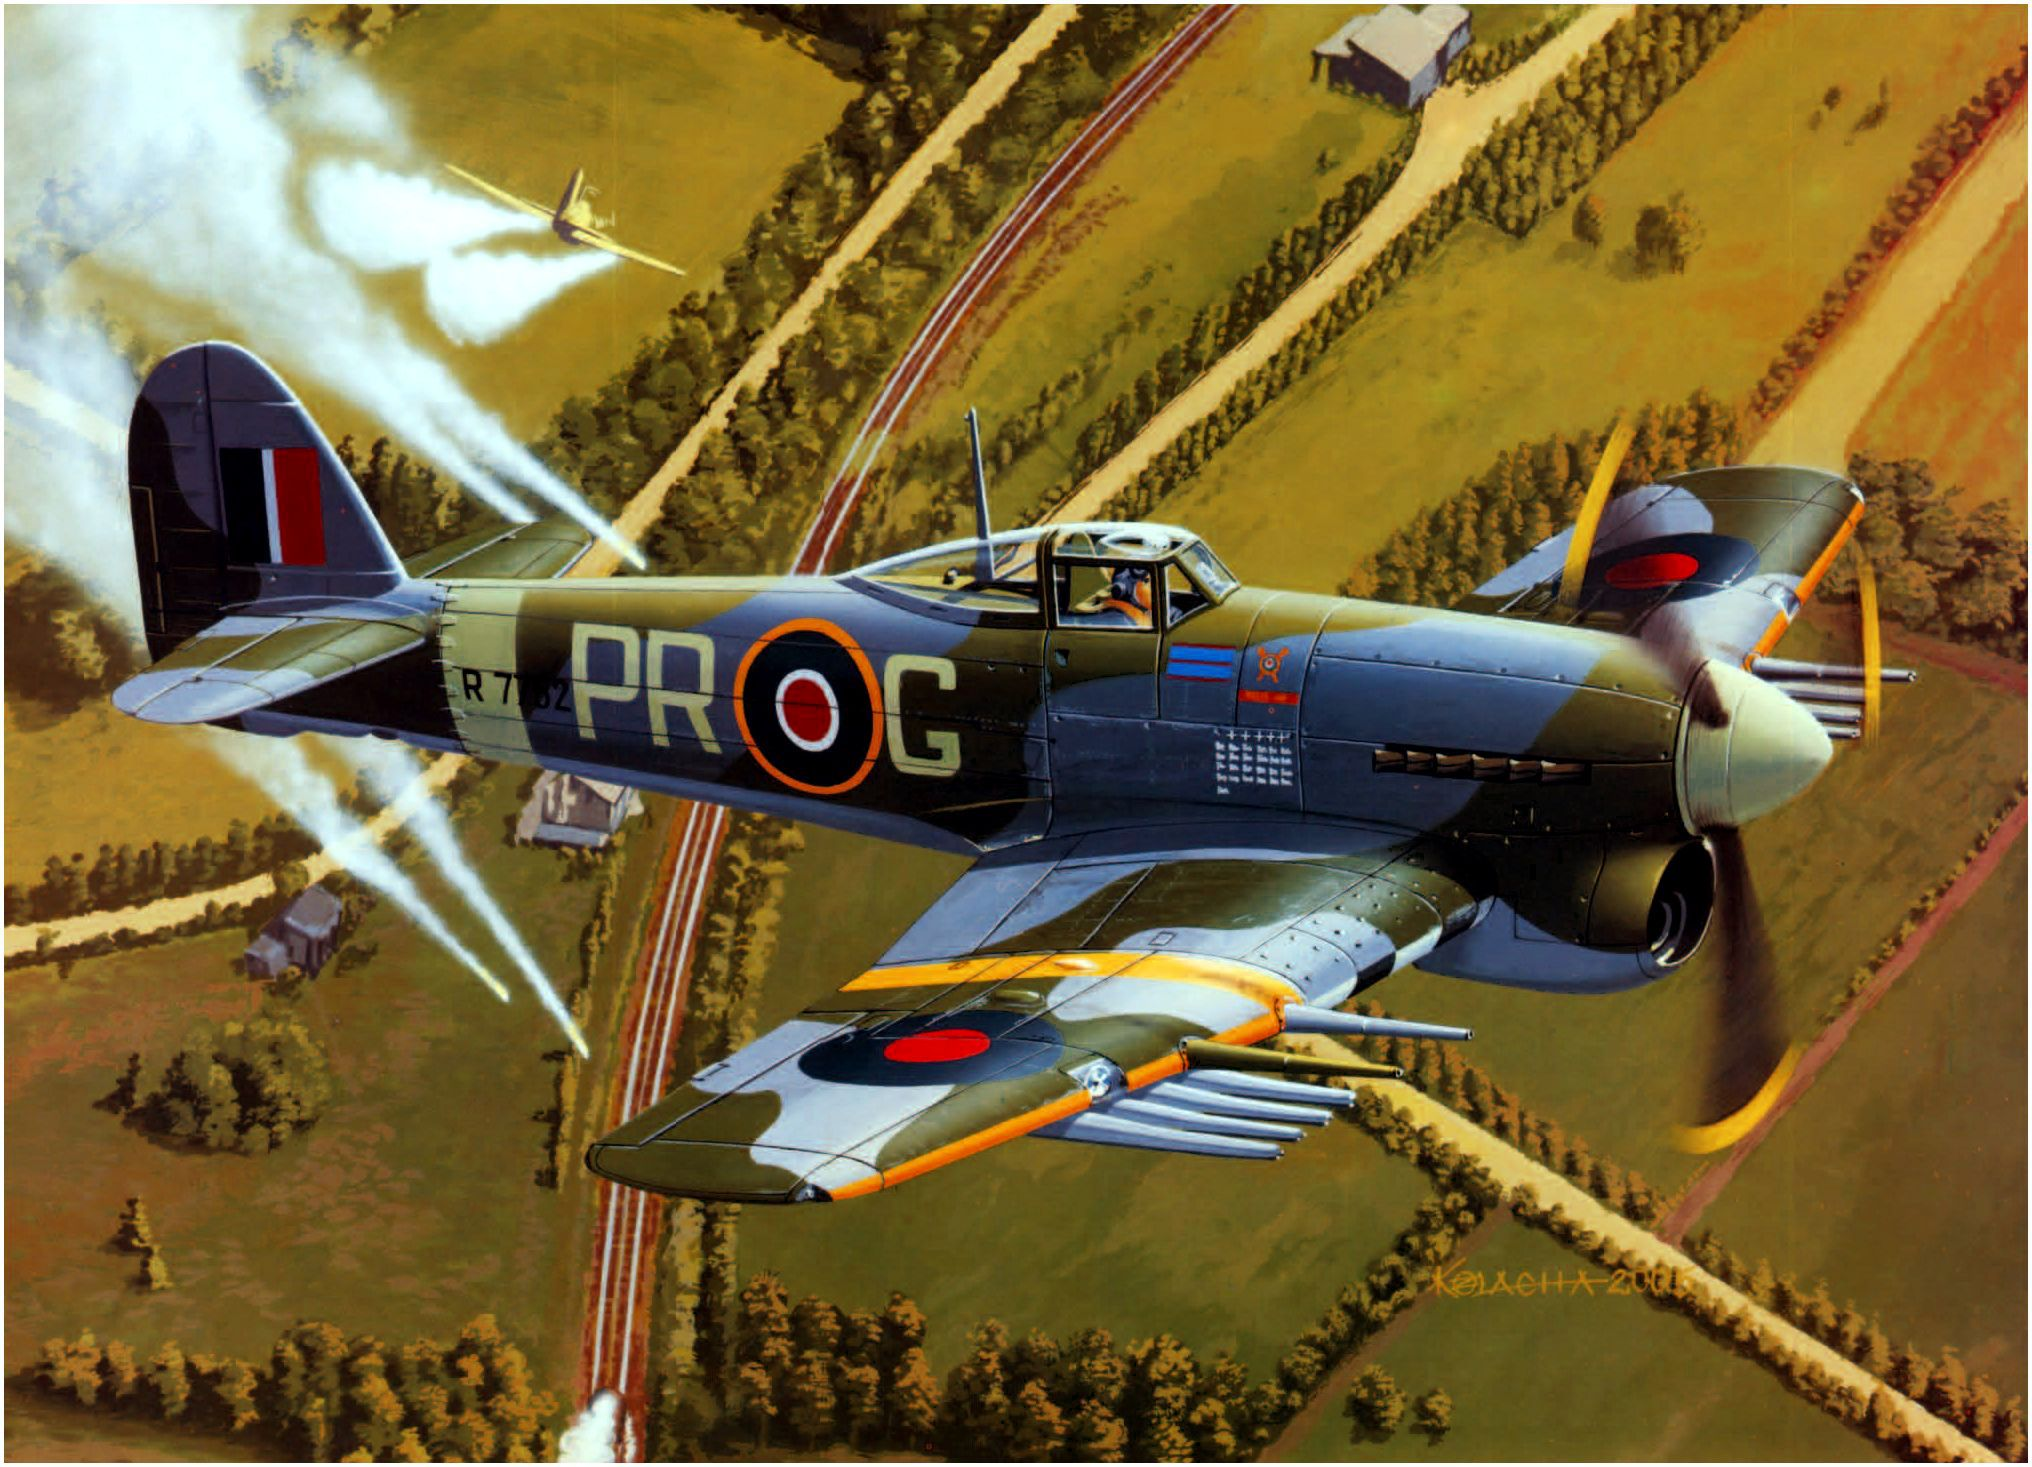 Kolacha Zbigniew. Тяжелый истребитель Hawker Typhoon.